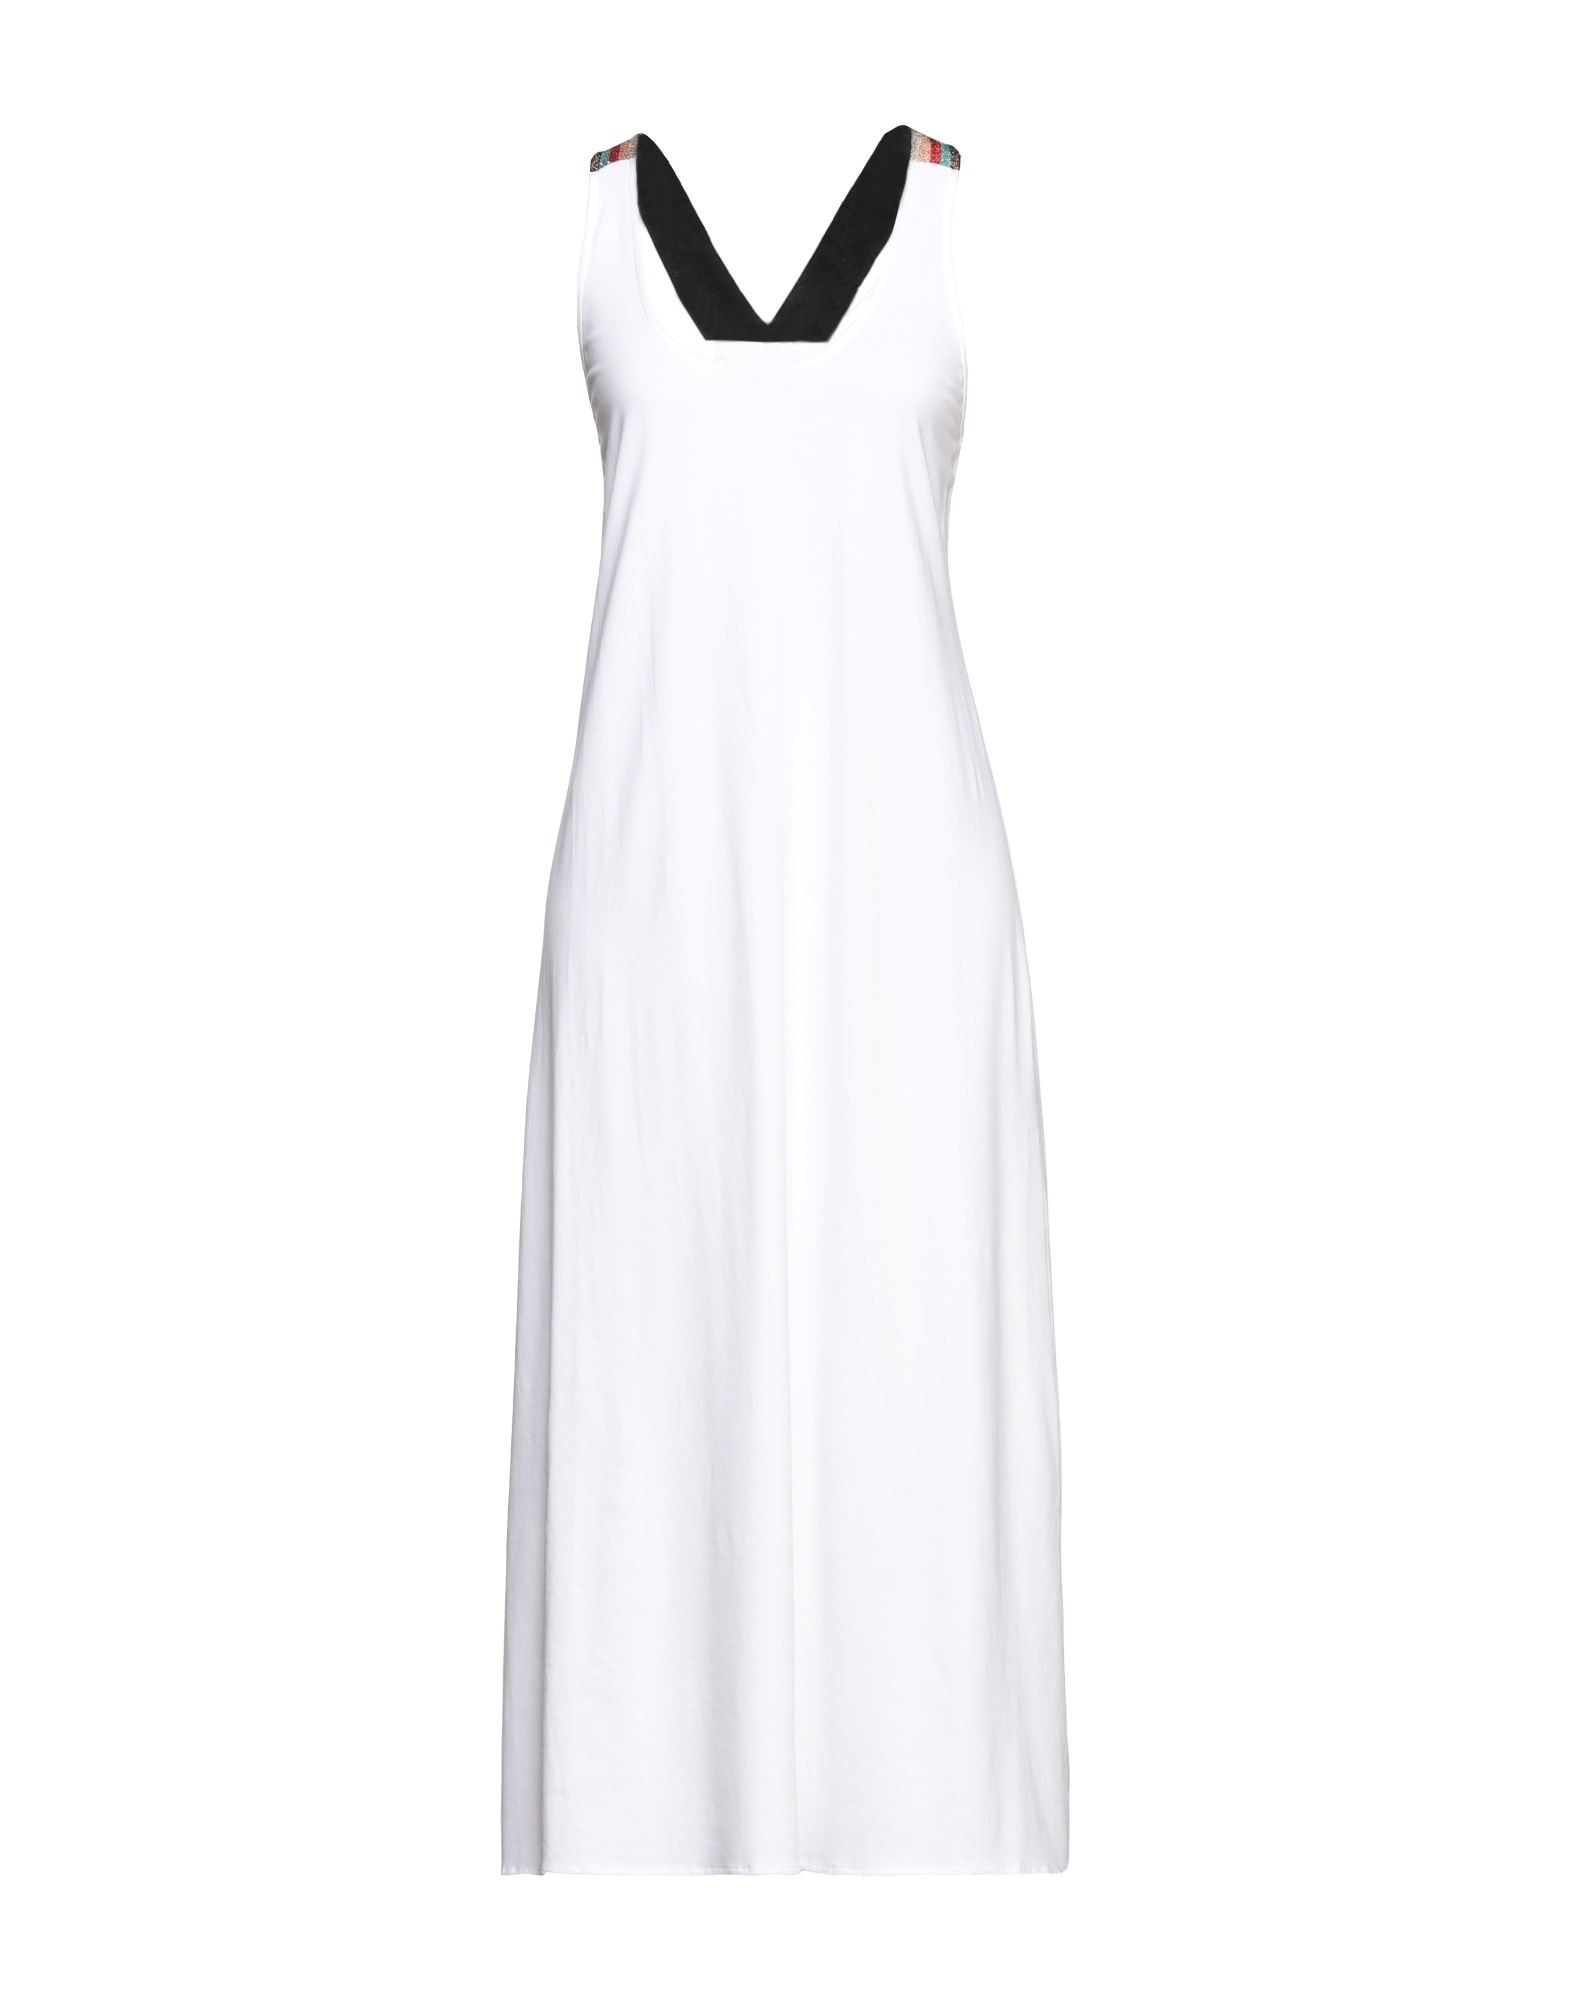 Фото - ALBERTINE Платье длиной 3/4 albertine disparue